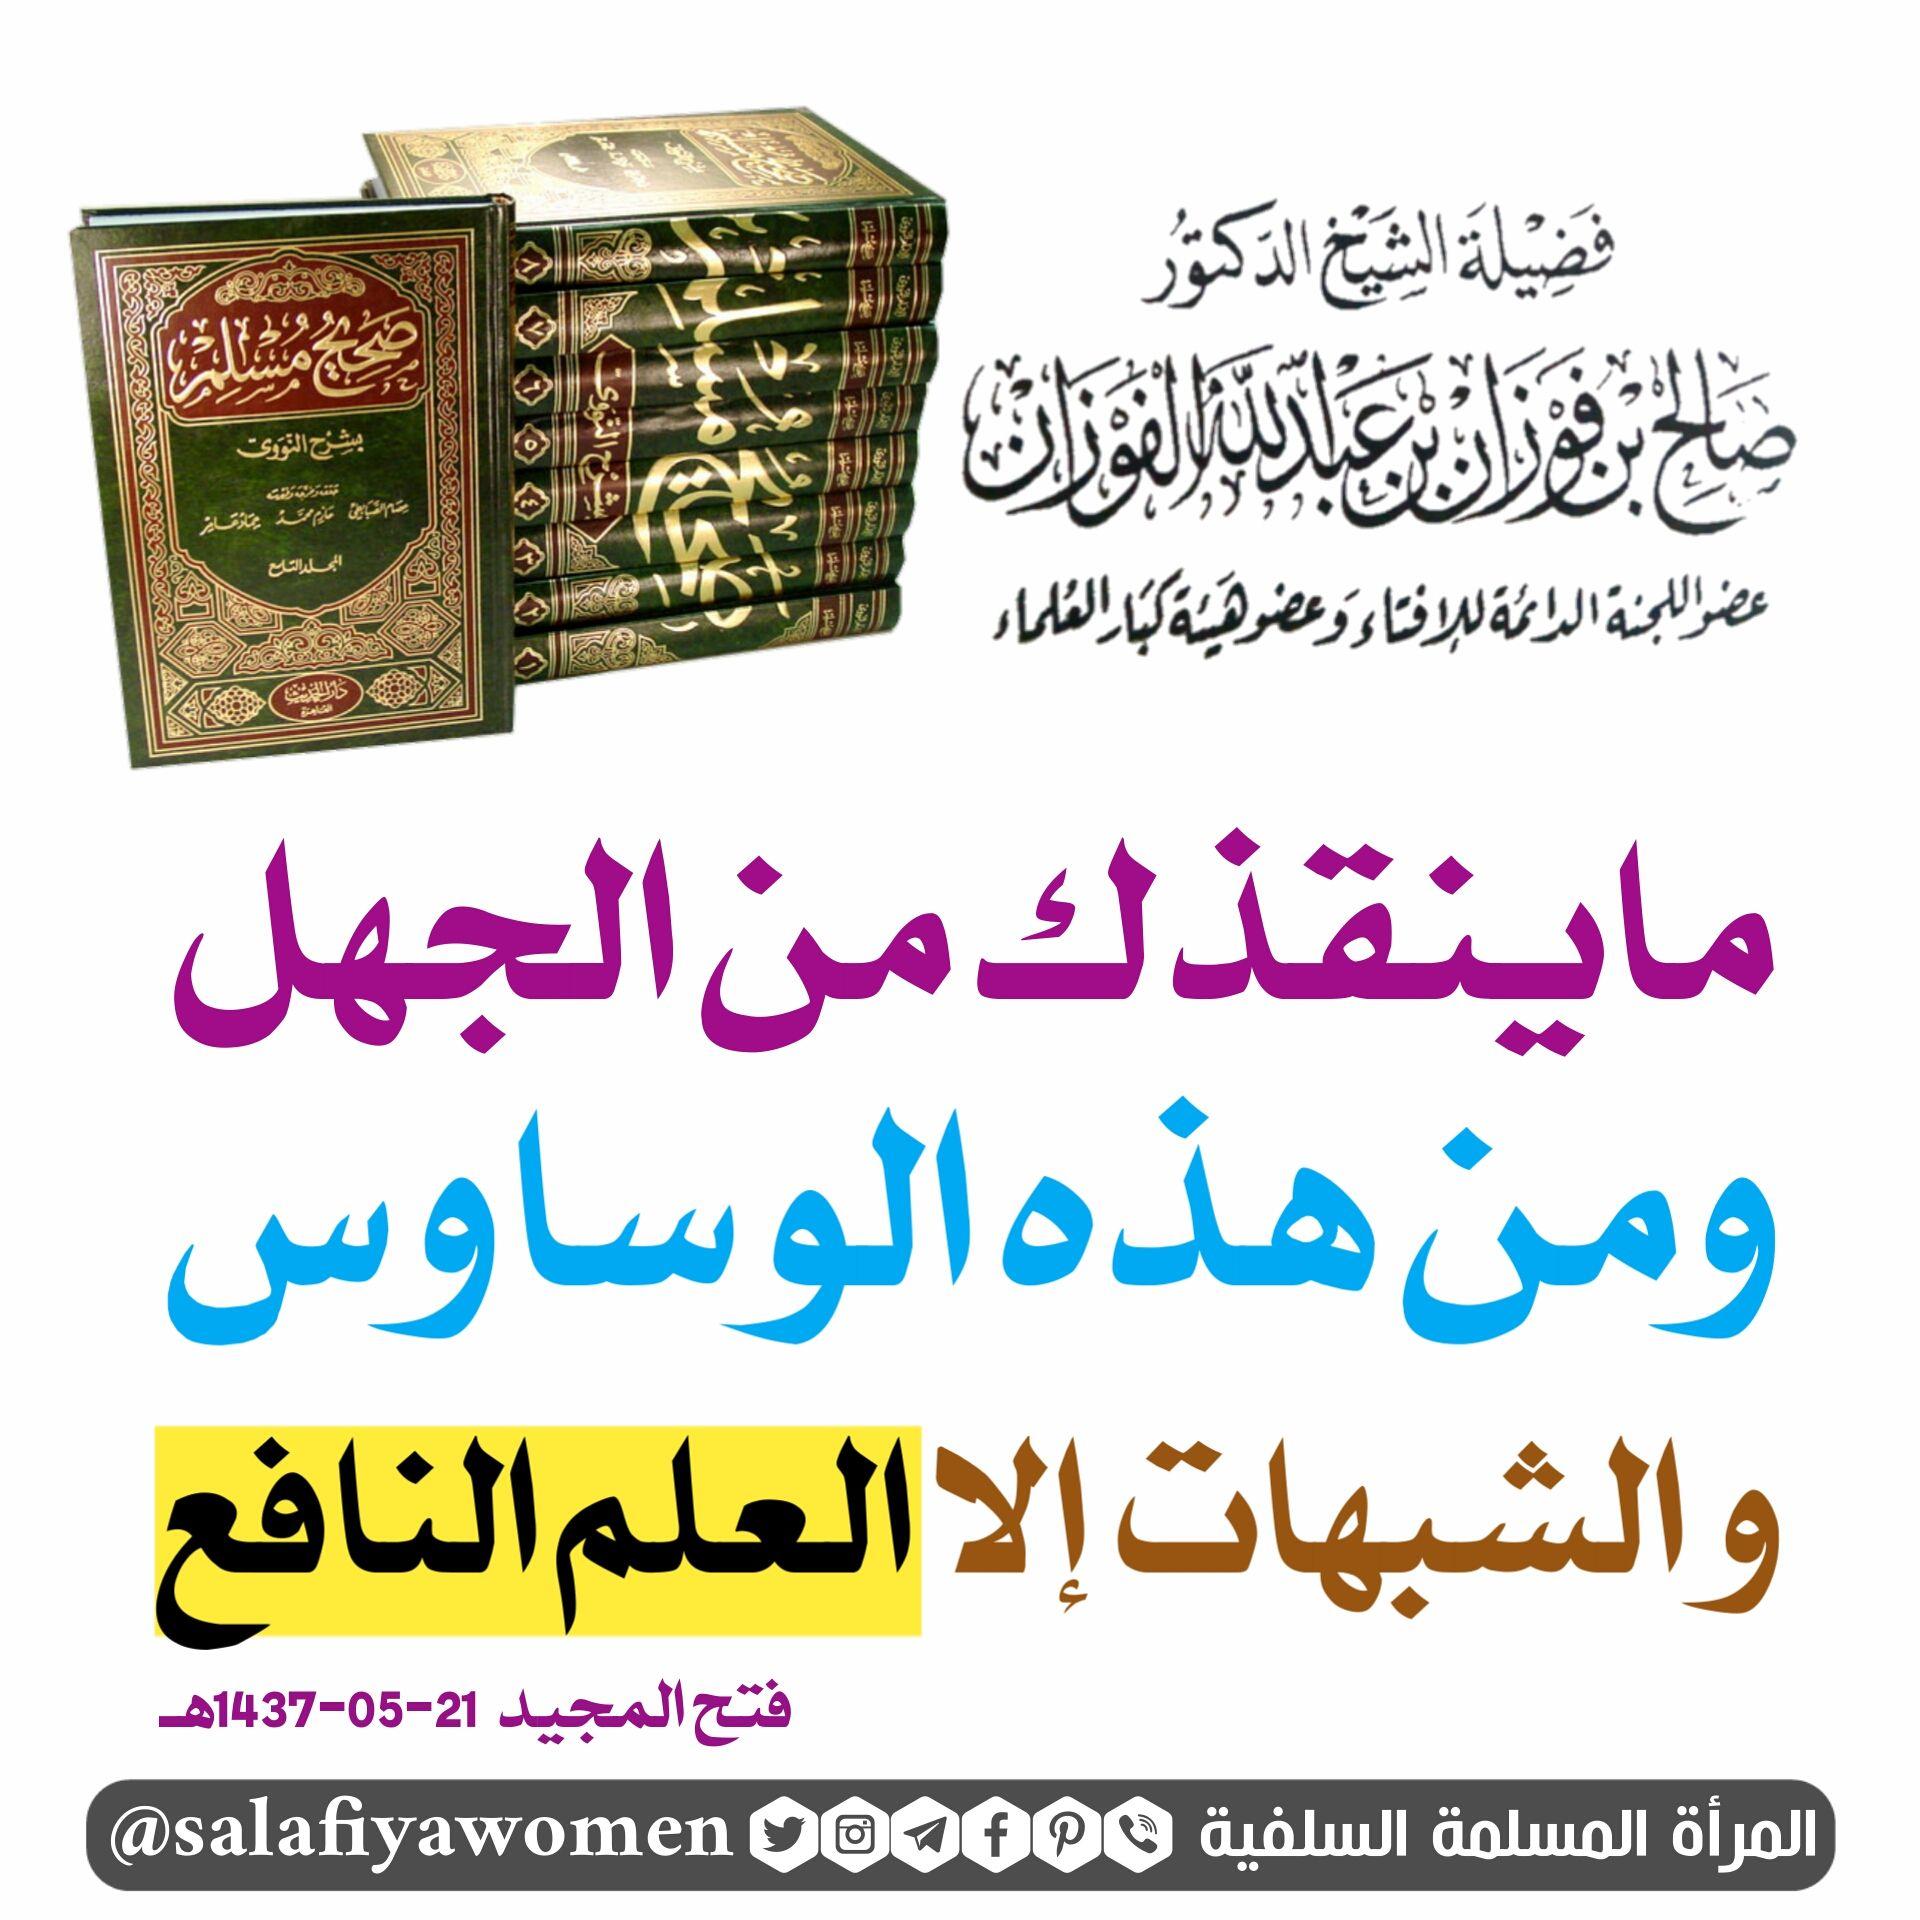 Pin By المرأة المسلمة On أقوال العلماء Arabic Calligraphy Calligraphy